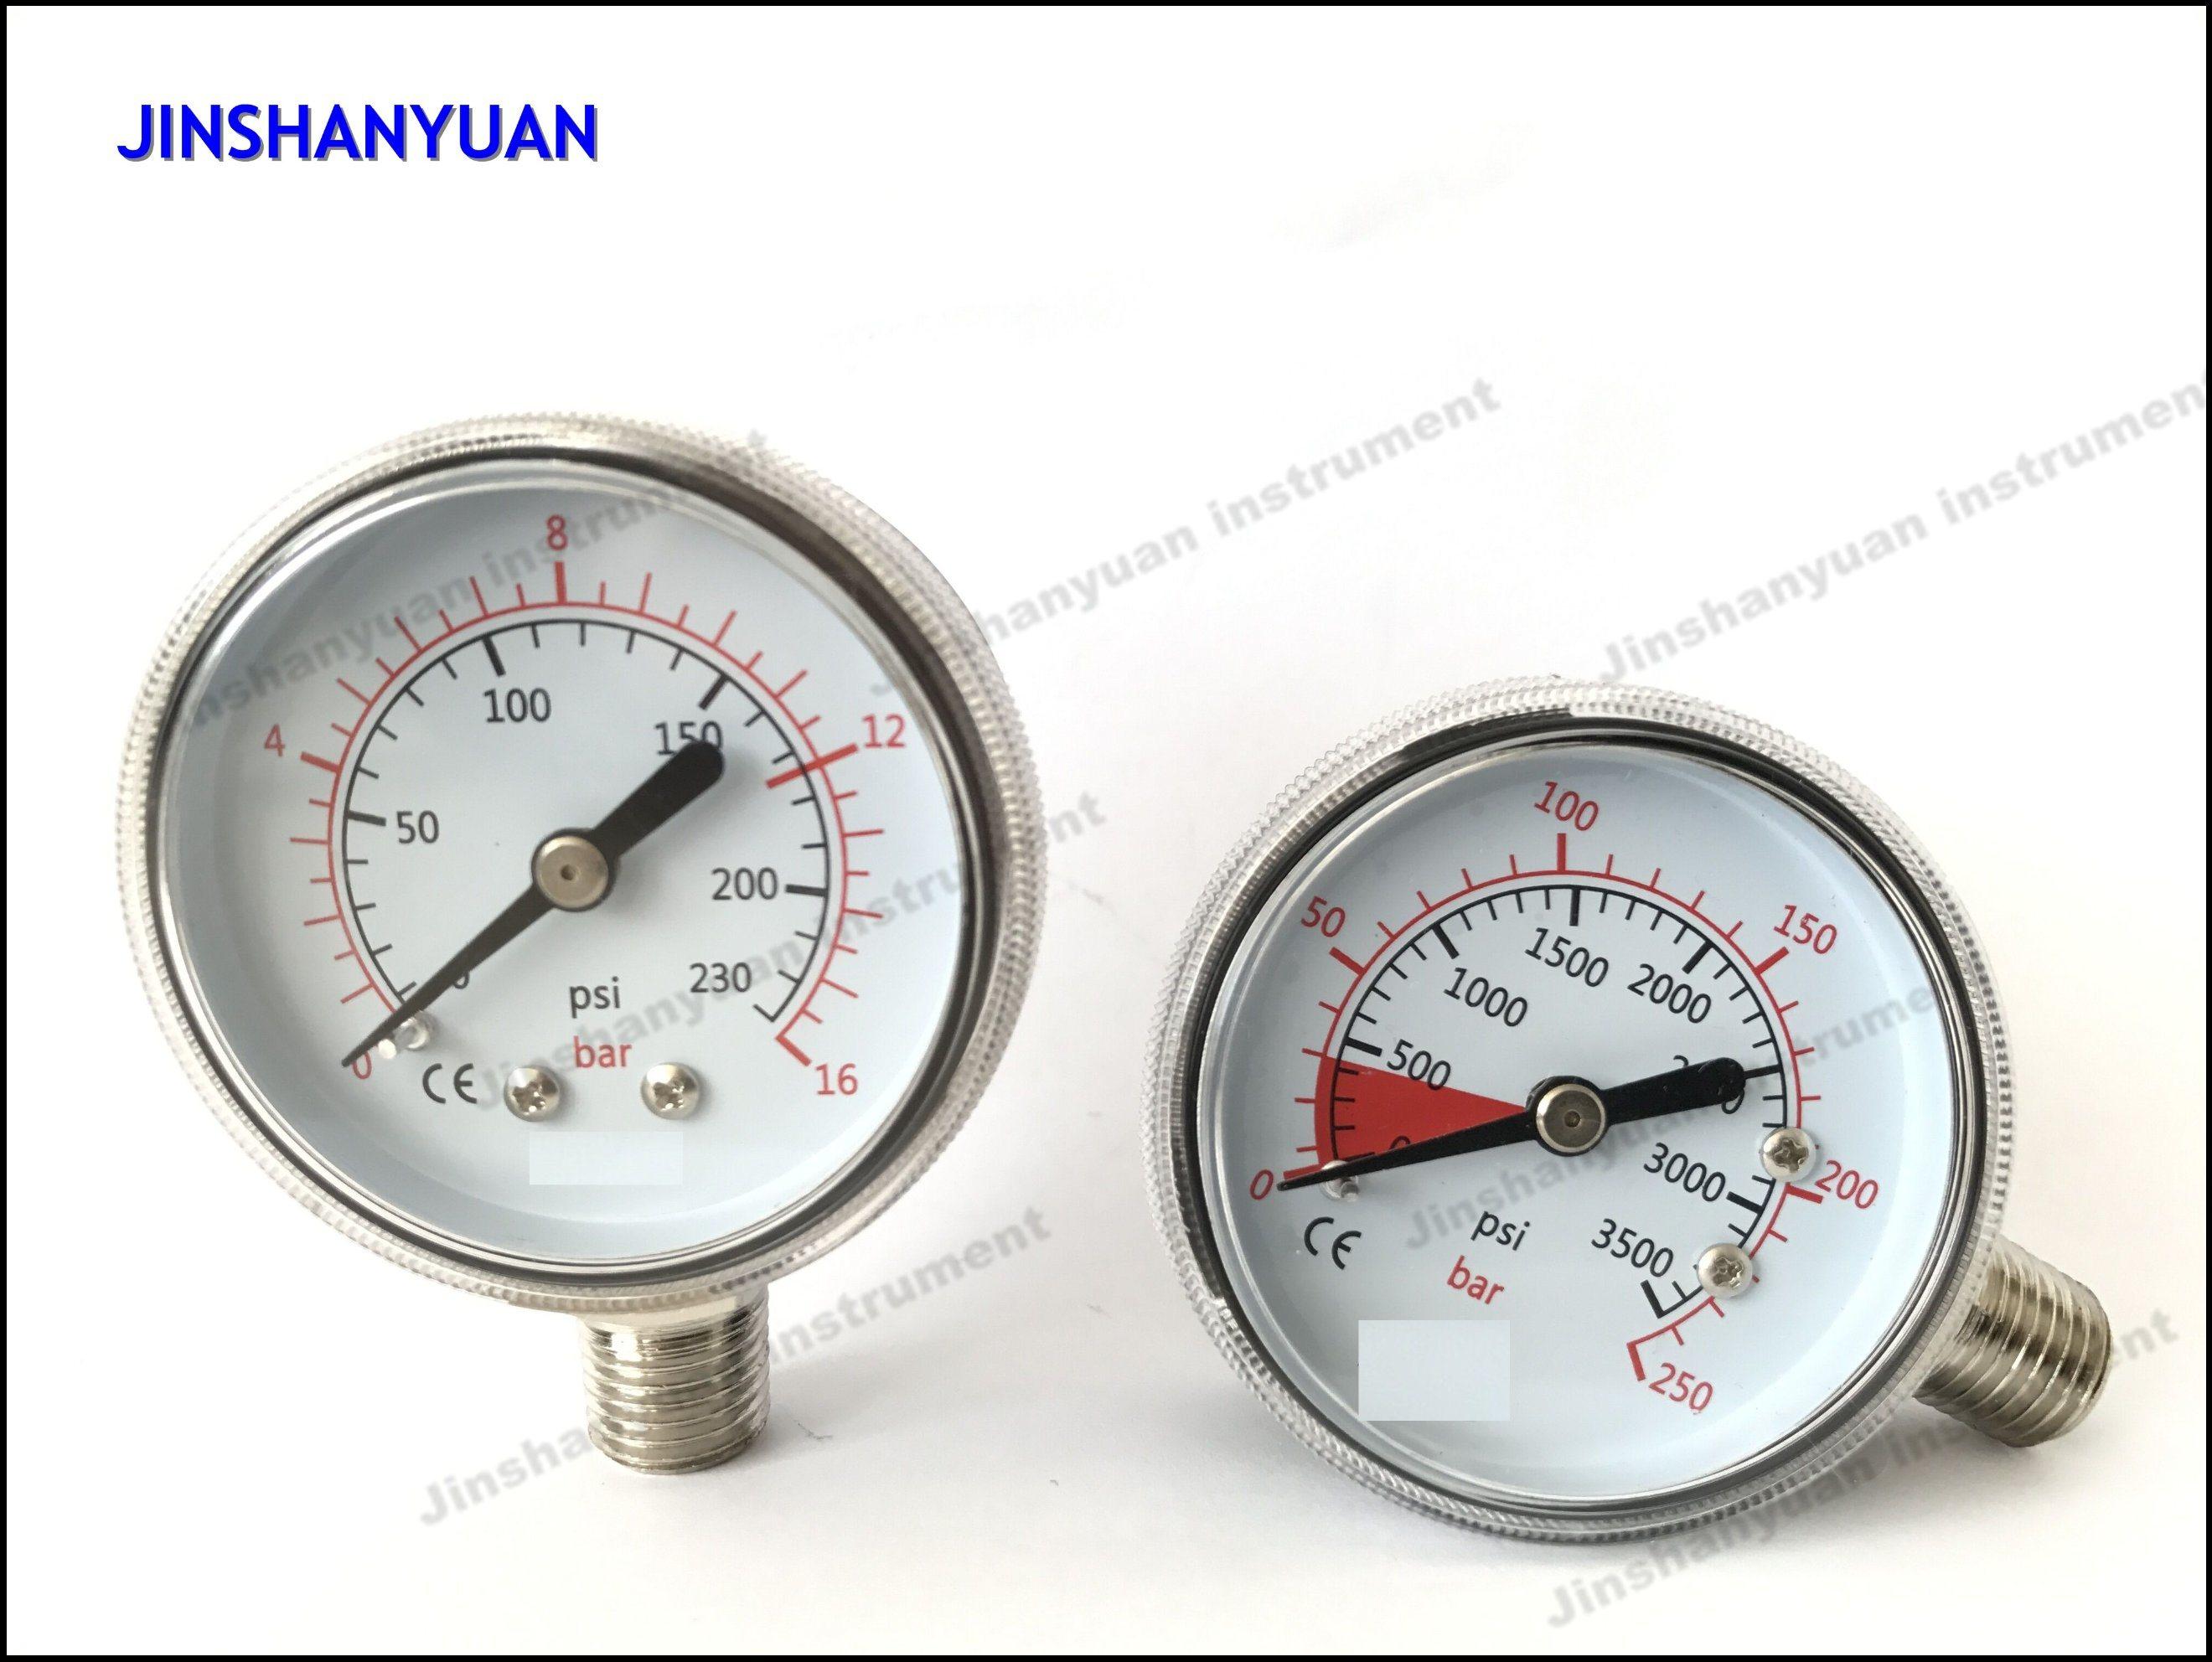 Gpg-006 Reduce Pressure for Ordinary Pressure Gauge/Regulator Double Manomter